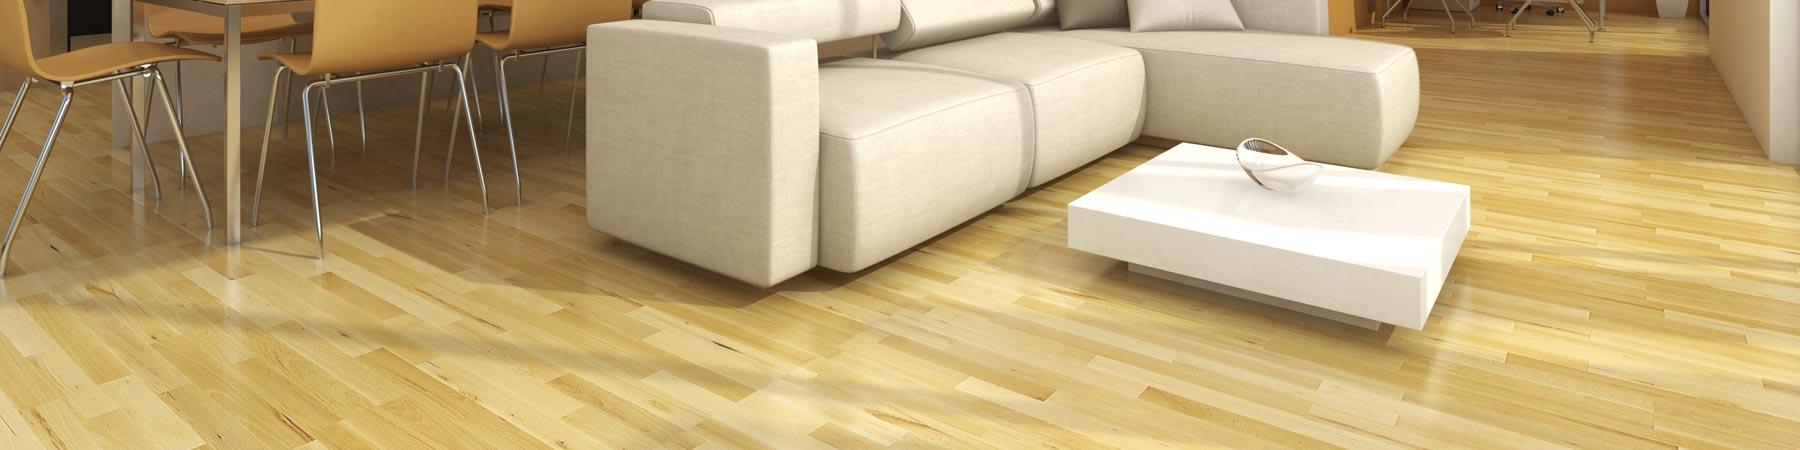 AA Plus Flooring Bamboo